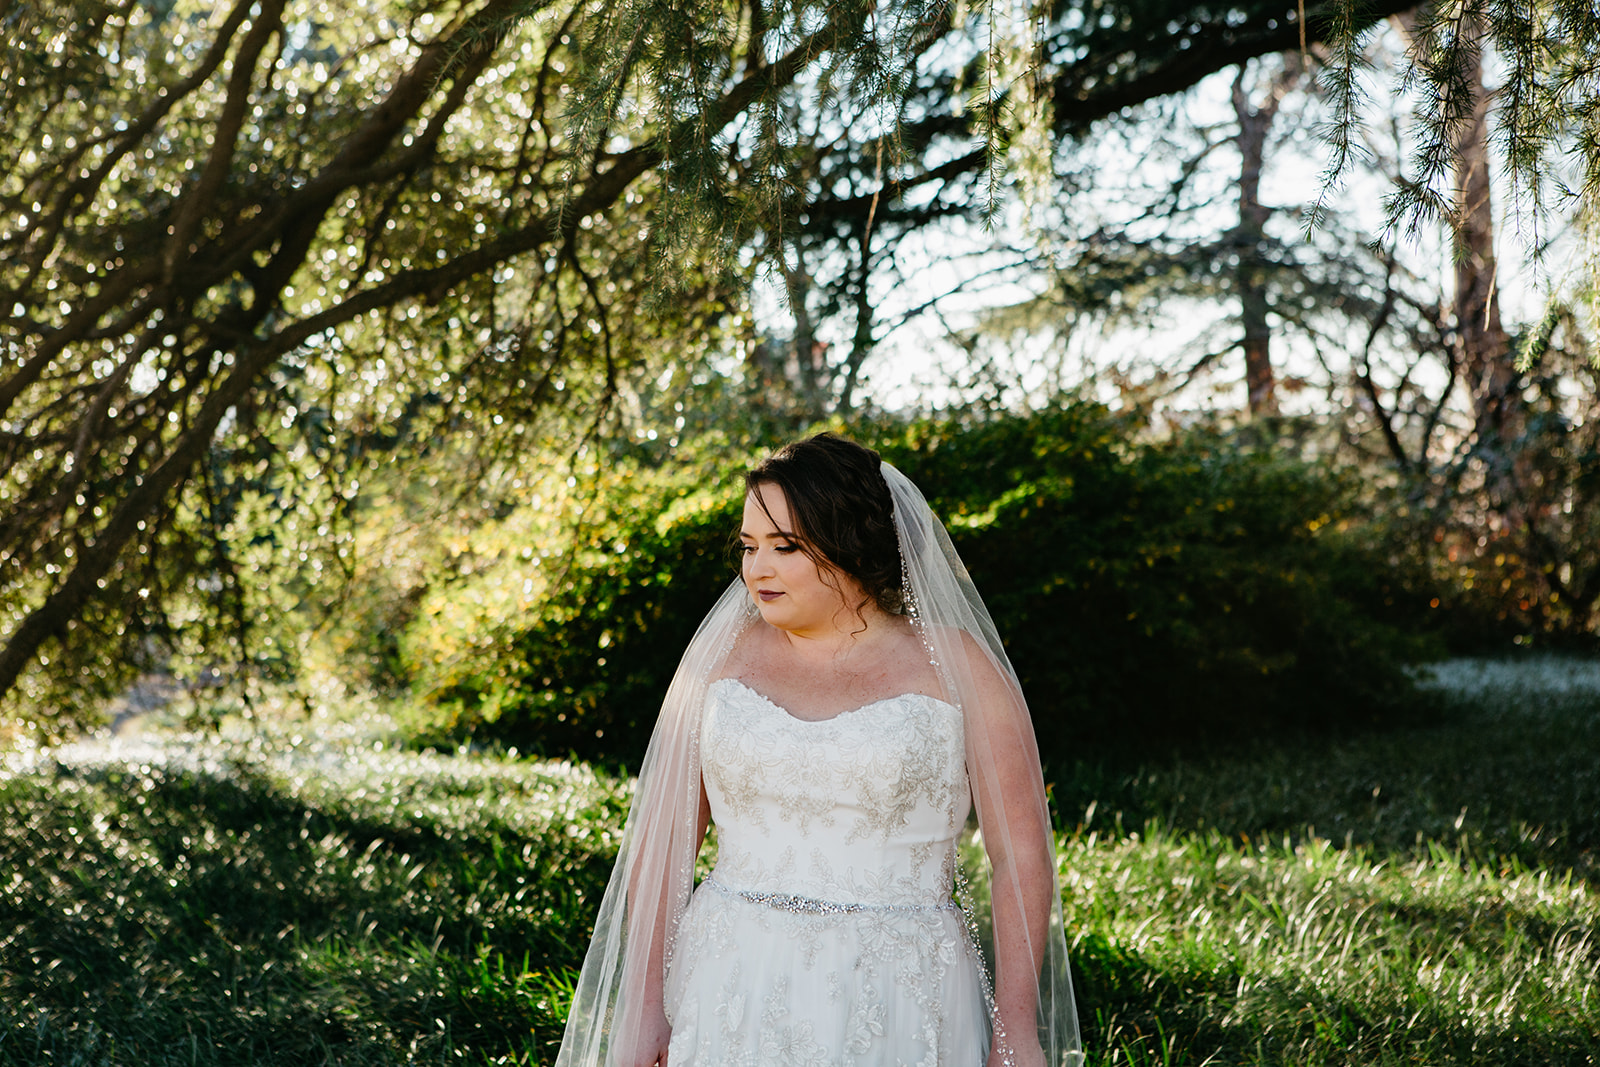 bridal portraits by south carolina wedding photography alexis schwallier-177.jpg